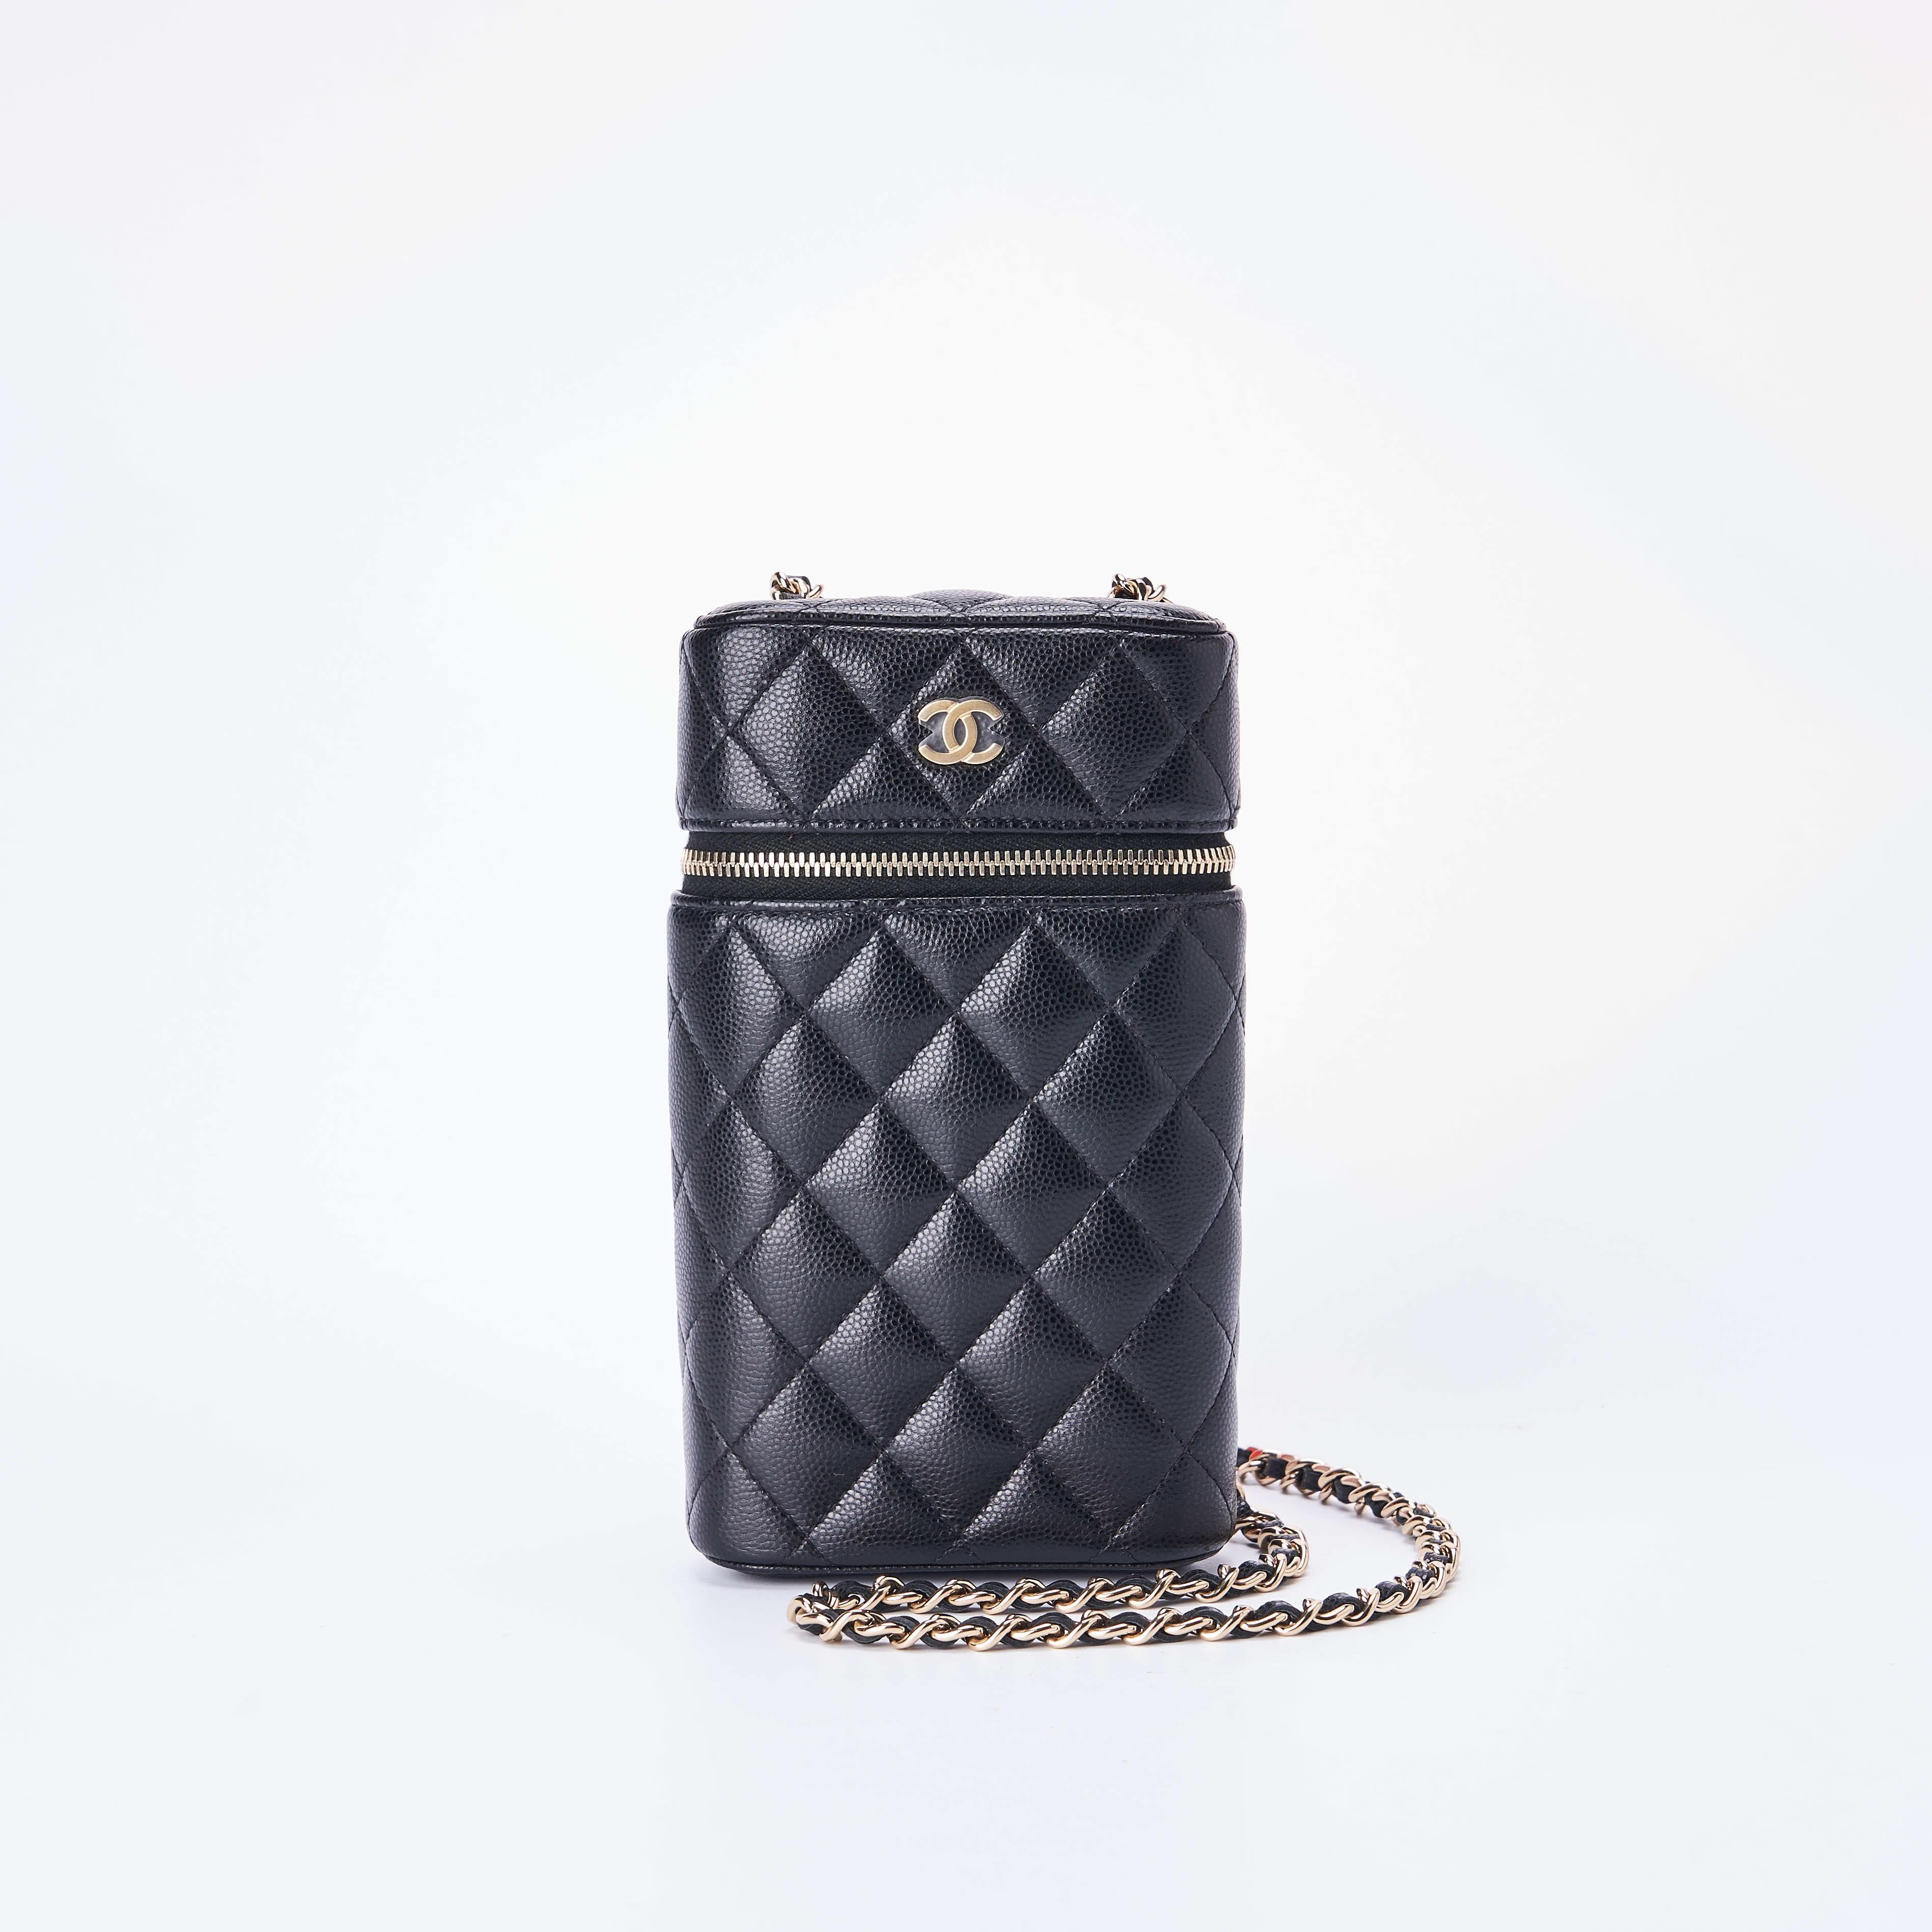 chanel链条包 临时【95新】Chanel香奈儿 链条手机包 17.5*10 公价¥12500_推荐淘宝好看的chanel链条包